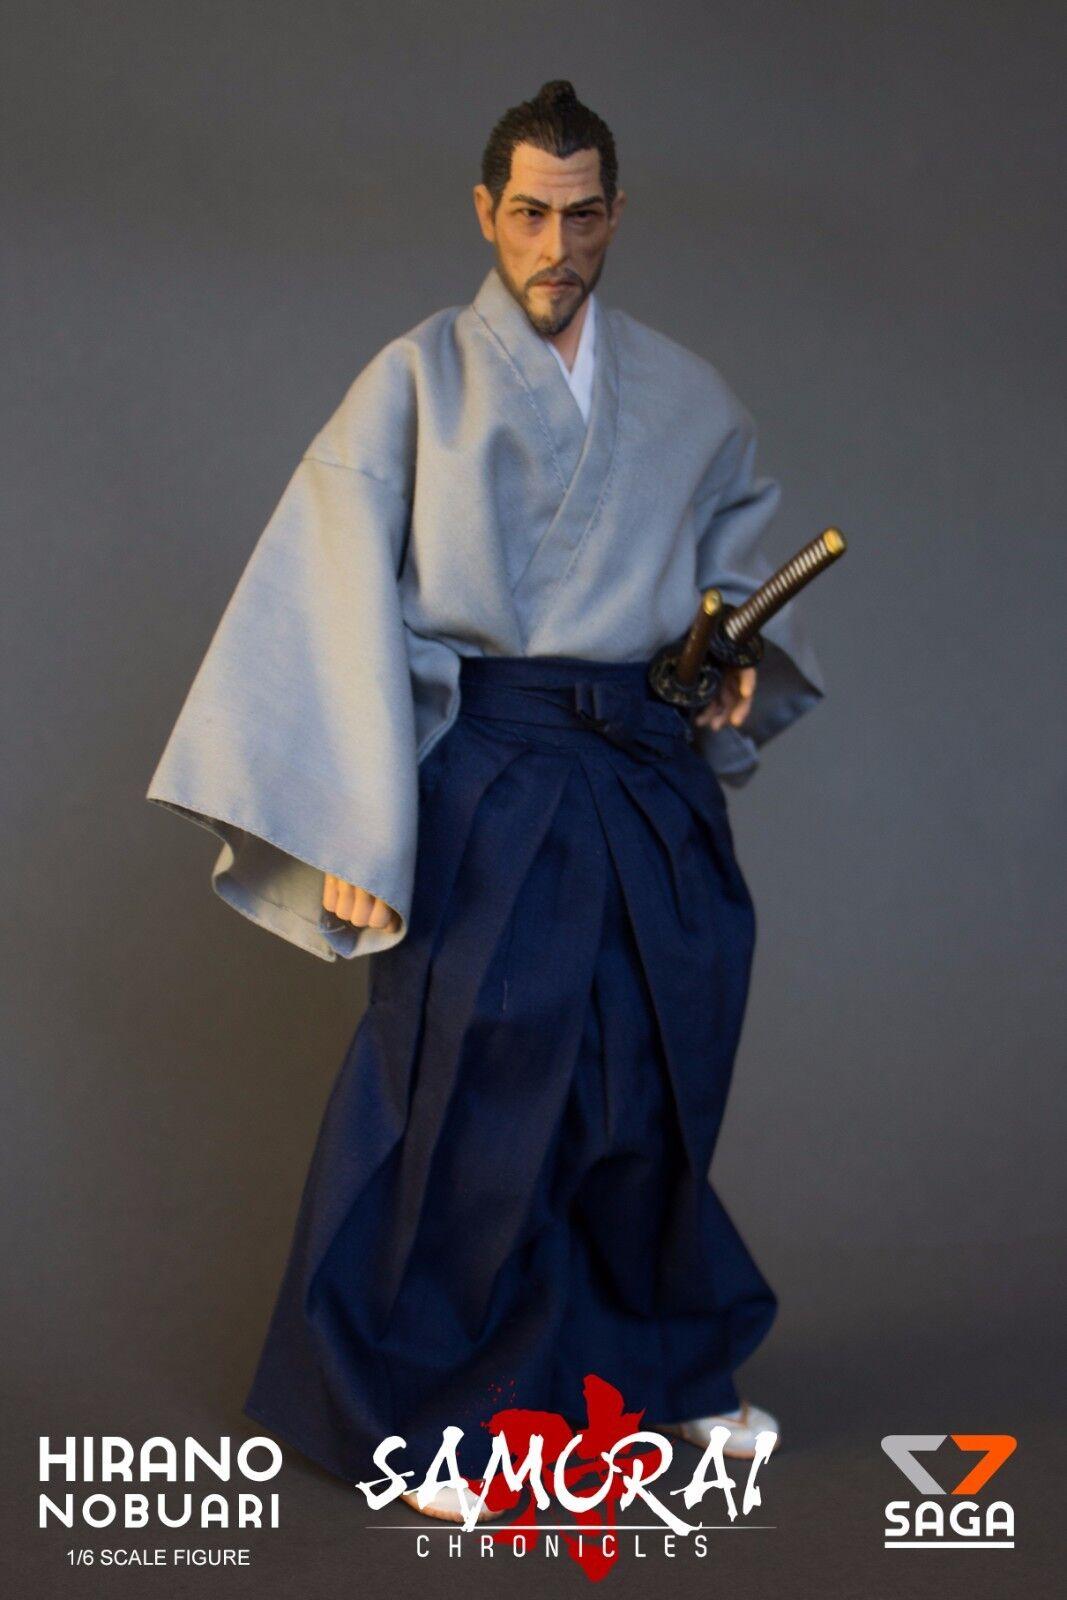 Hirano Nobuari 1 6 Scale Figure Samurai Chronicles by 7 Saga Figures